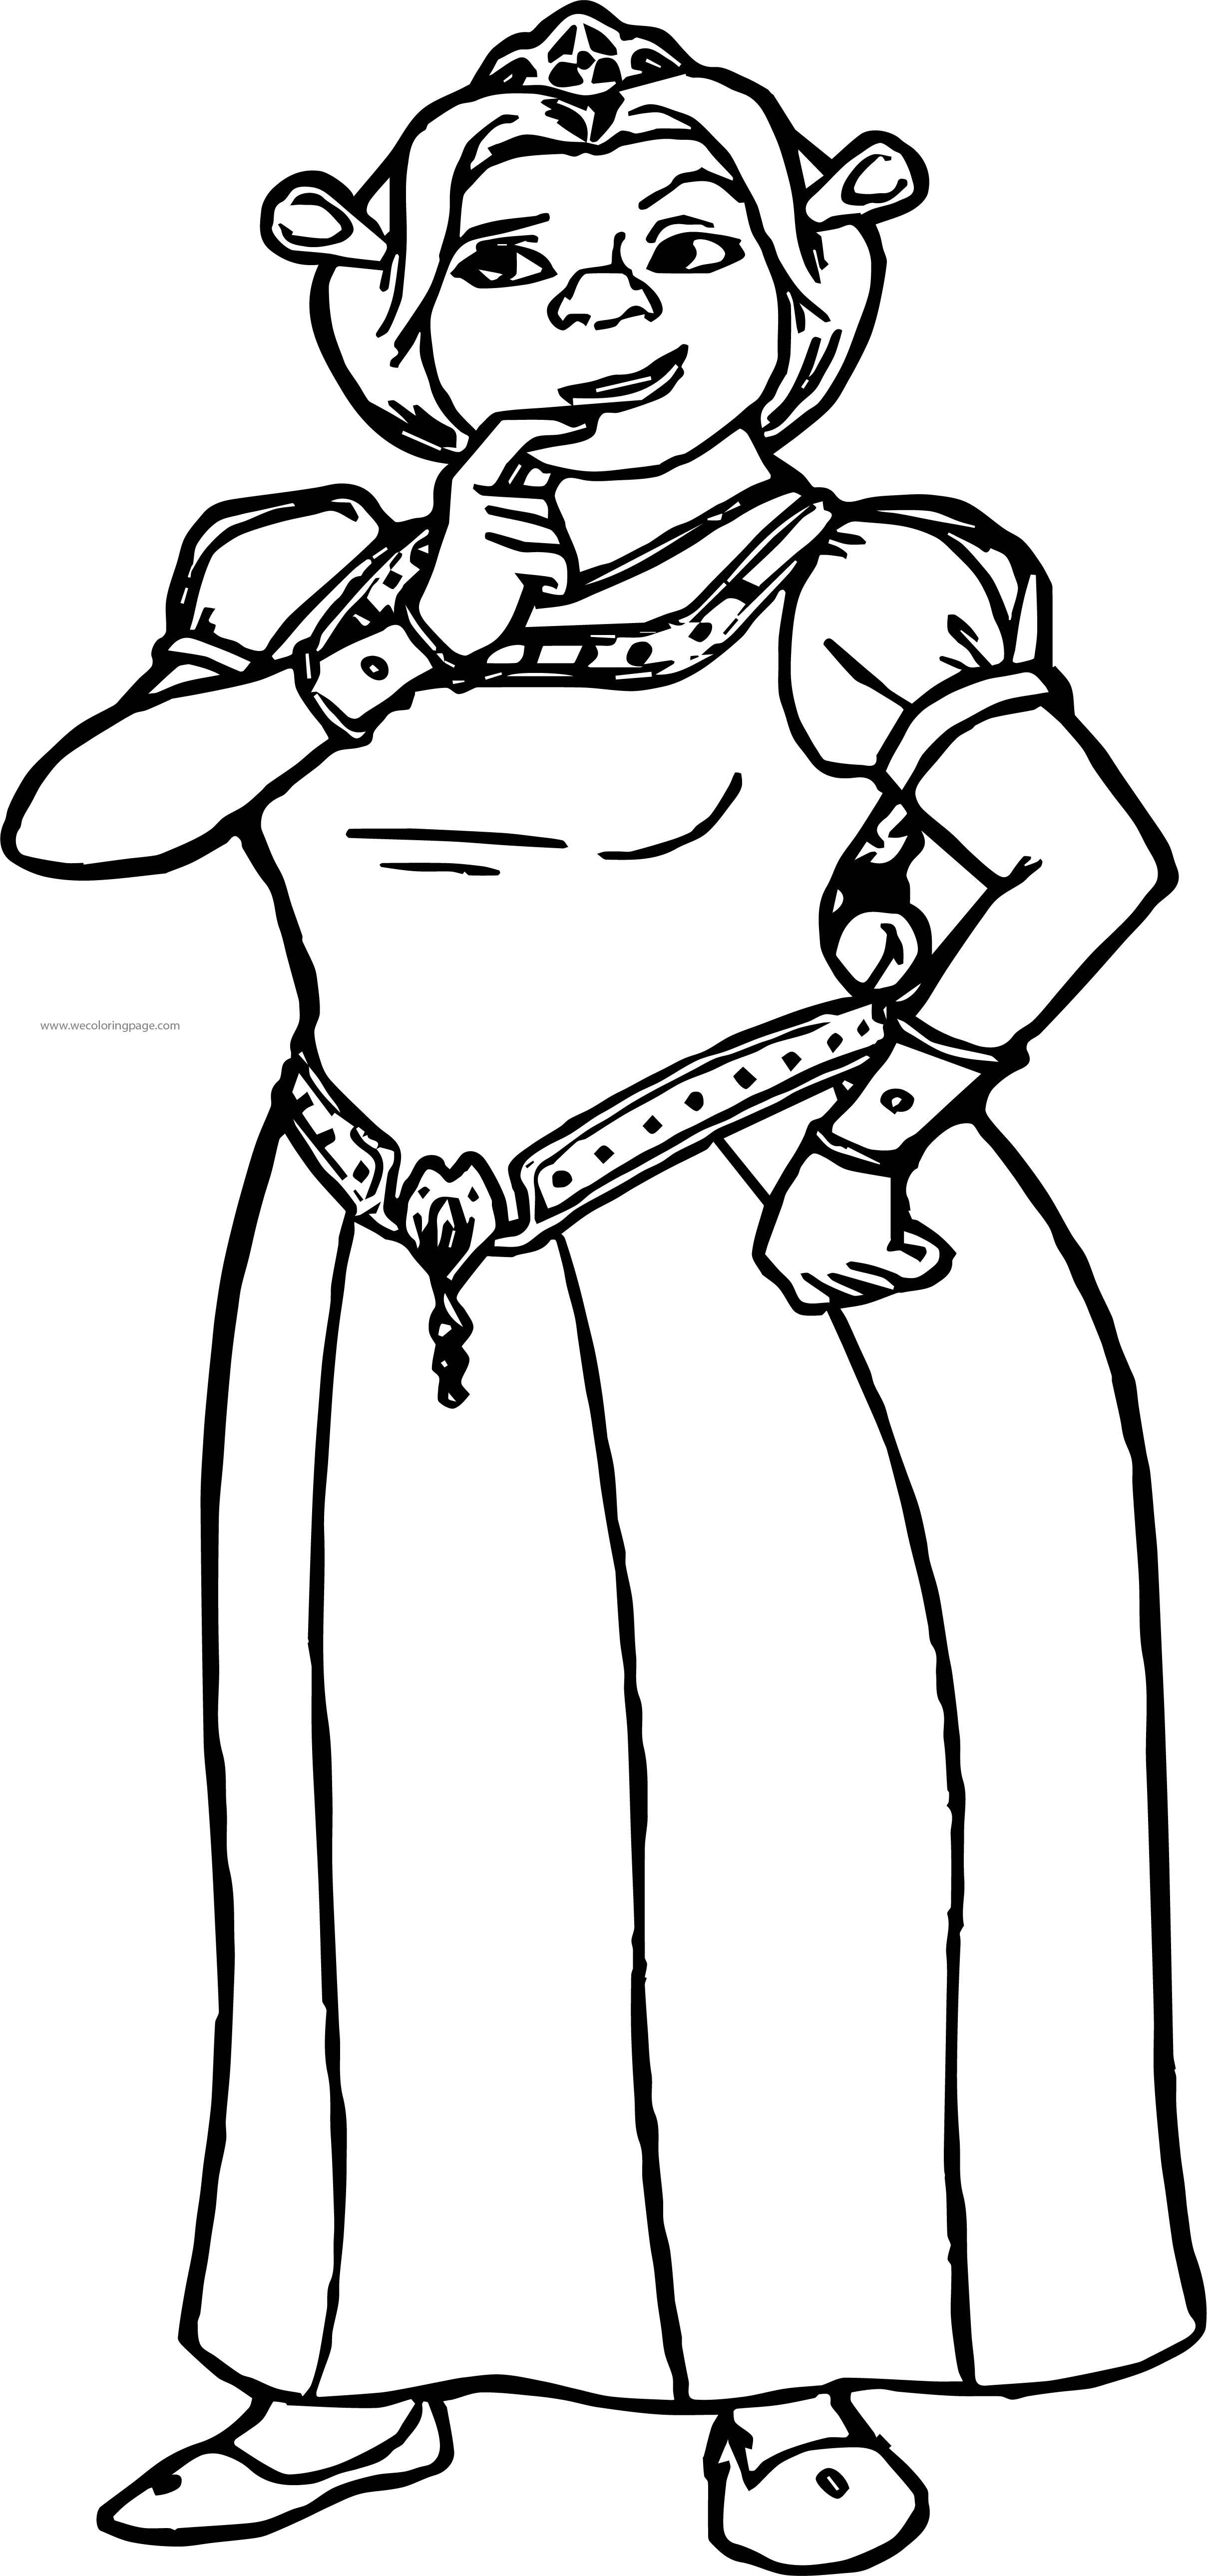 Shrek Thinking Girl Coloring Page